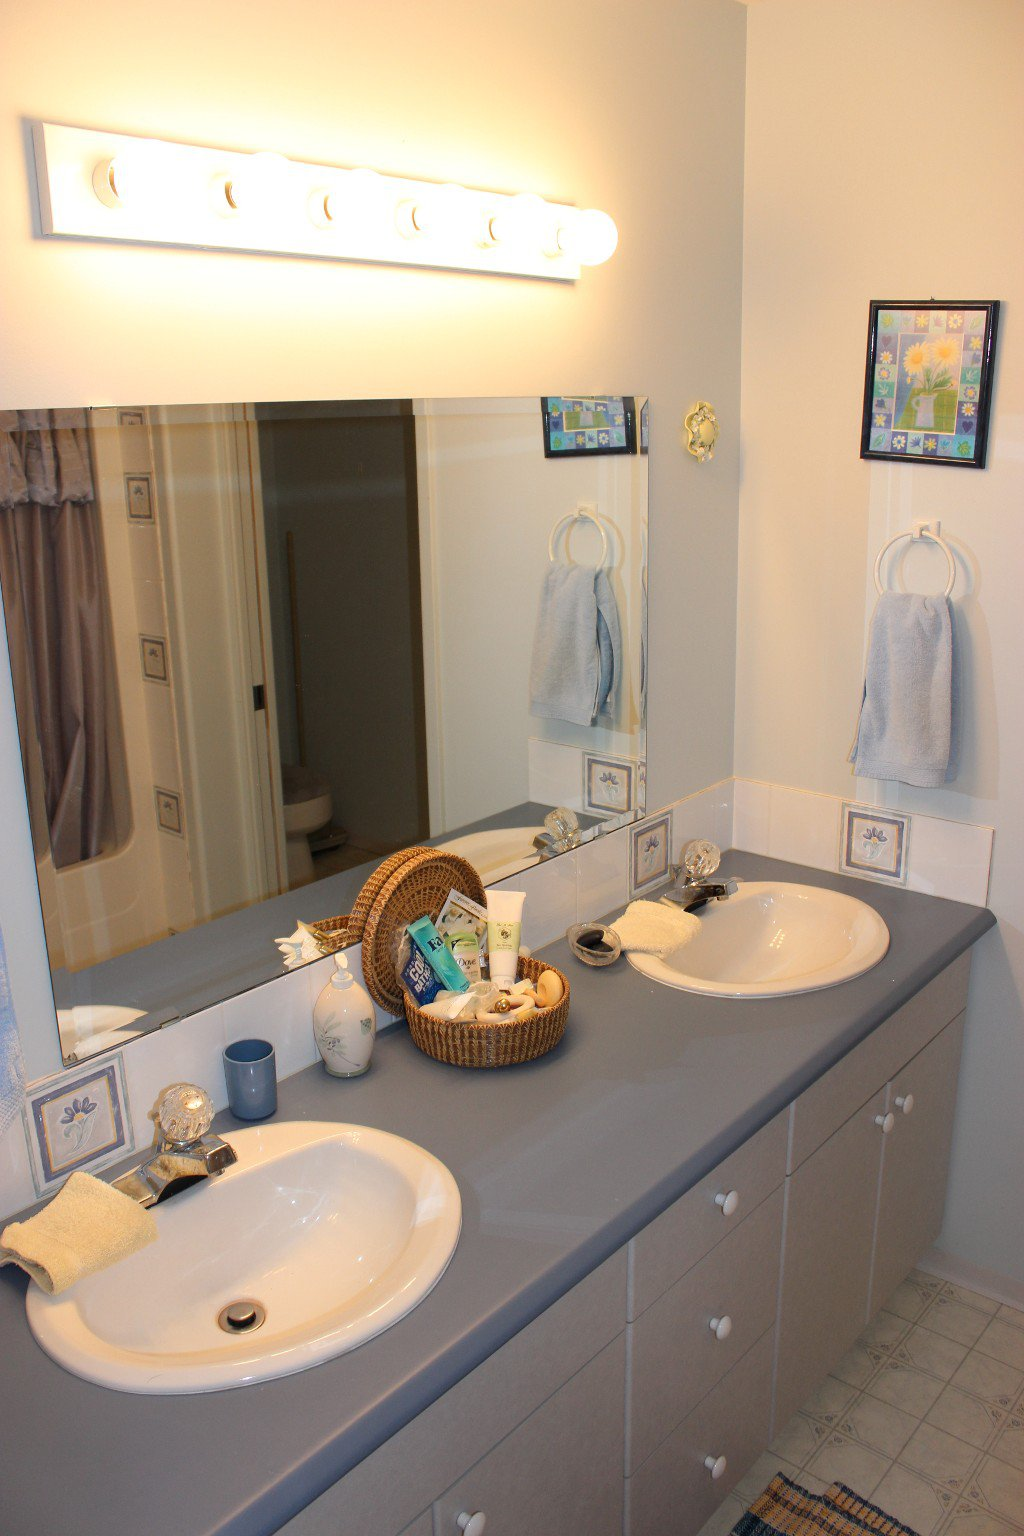 Photo 20: Photos: 617 Bissette Road in Kamloops: Westsyde House for sale : MLS®# 131131